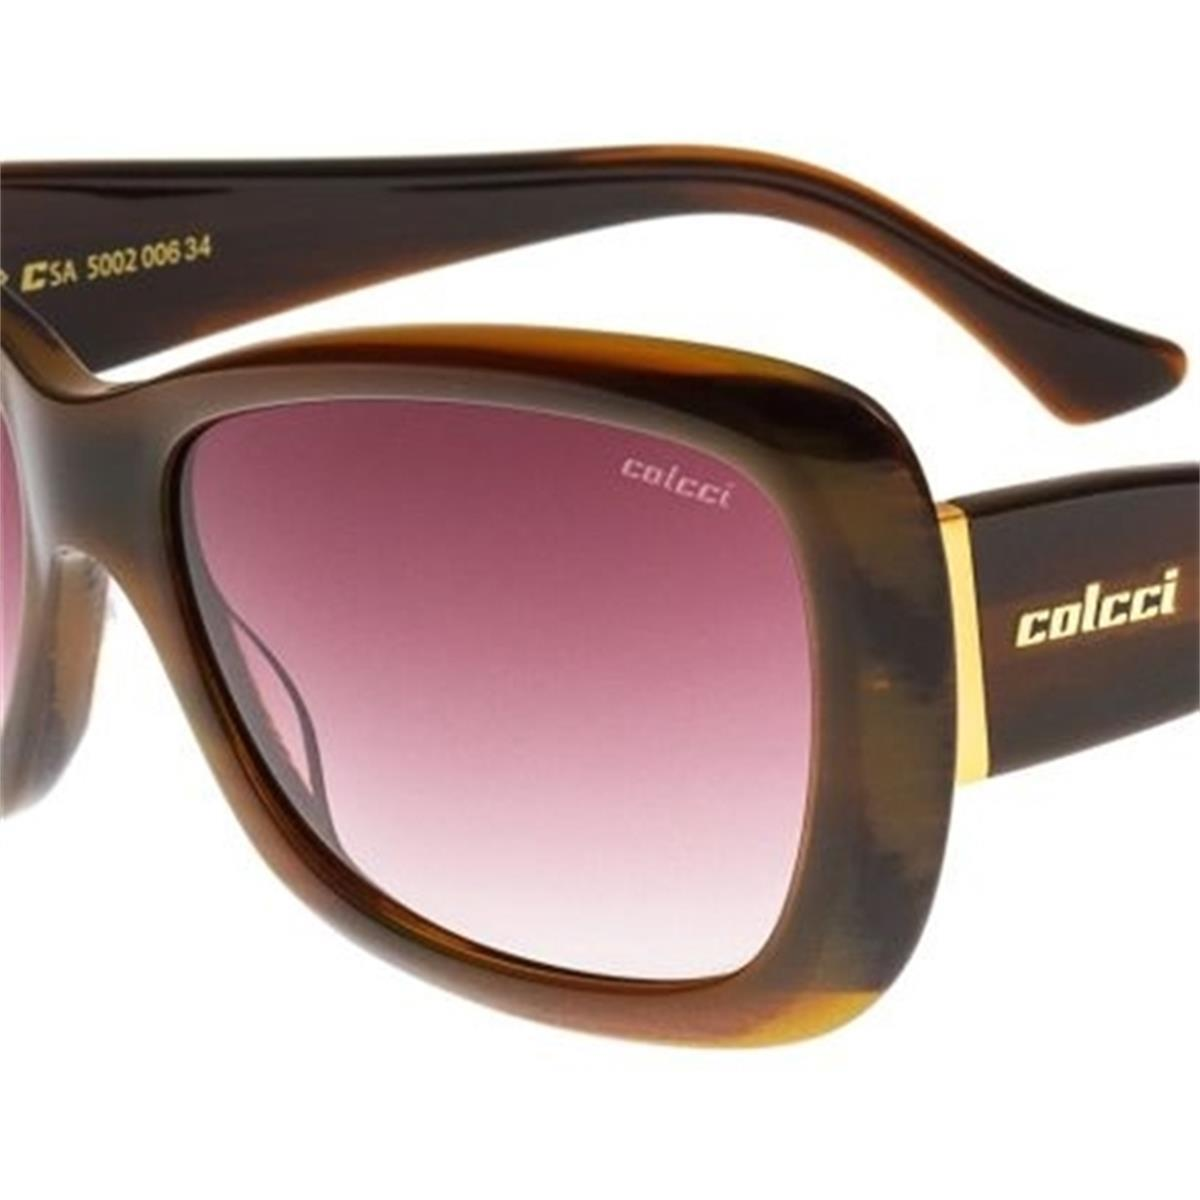 Óculos de Sol Marrom Marmorizado Feminino 5002 Colcci 34e1b0ea8c